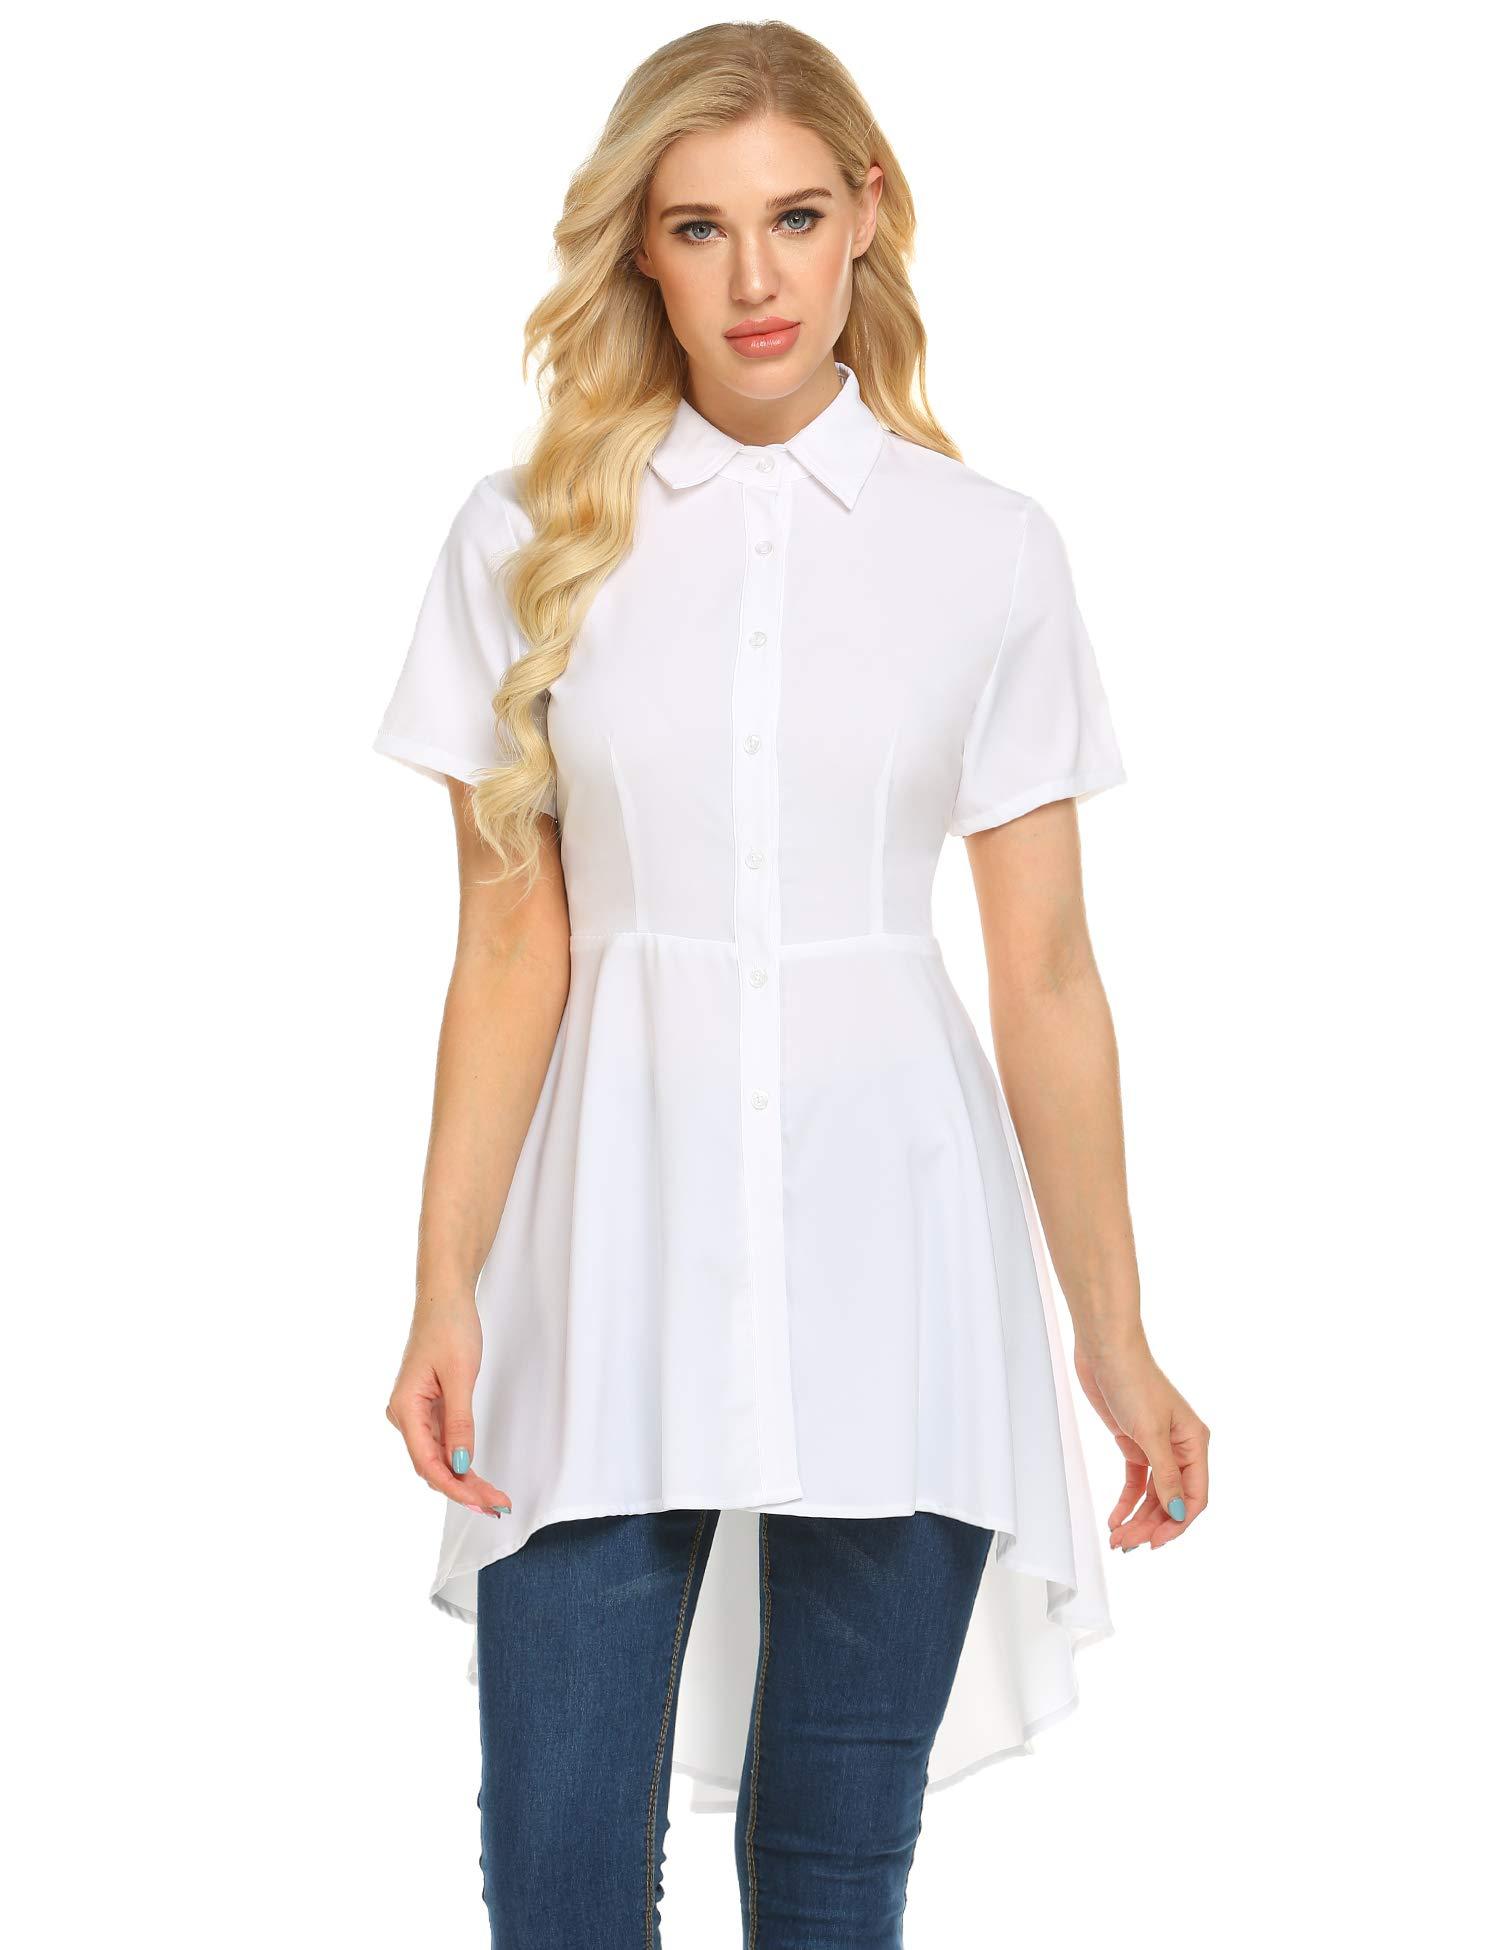 Zeagoo Womens Blouses and Tops Ruffle Short Sleeve Asymmetric High Low Club Shirt Dress